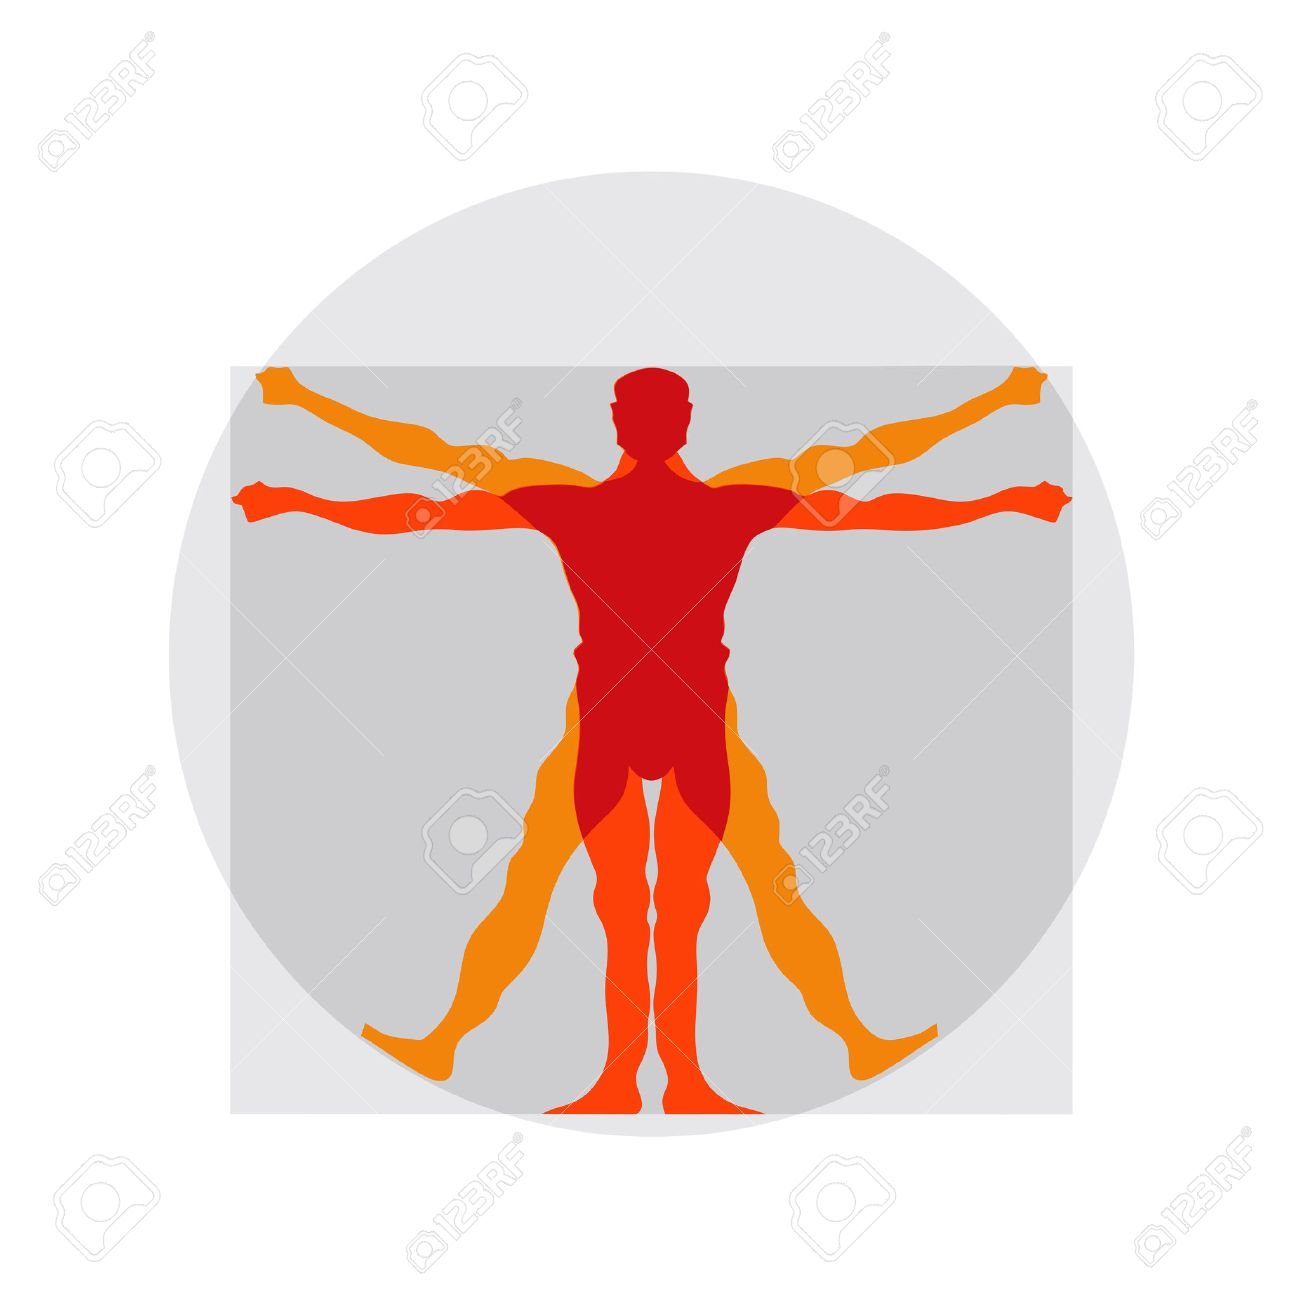 Vetruvian Man Human Anatomy Study By Leonardo Da Vinci Royalty Free